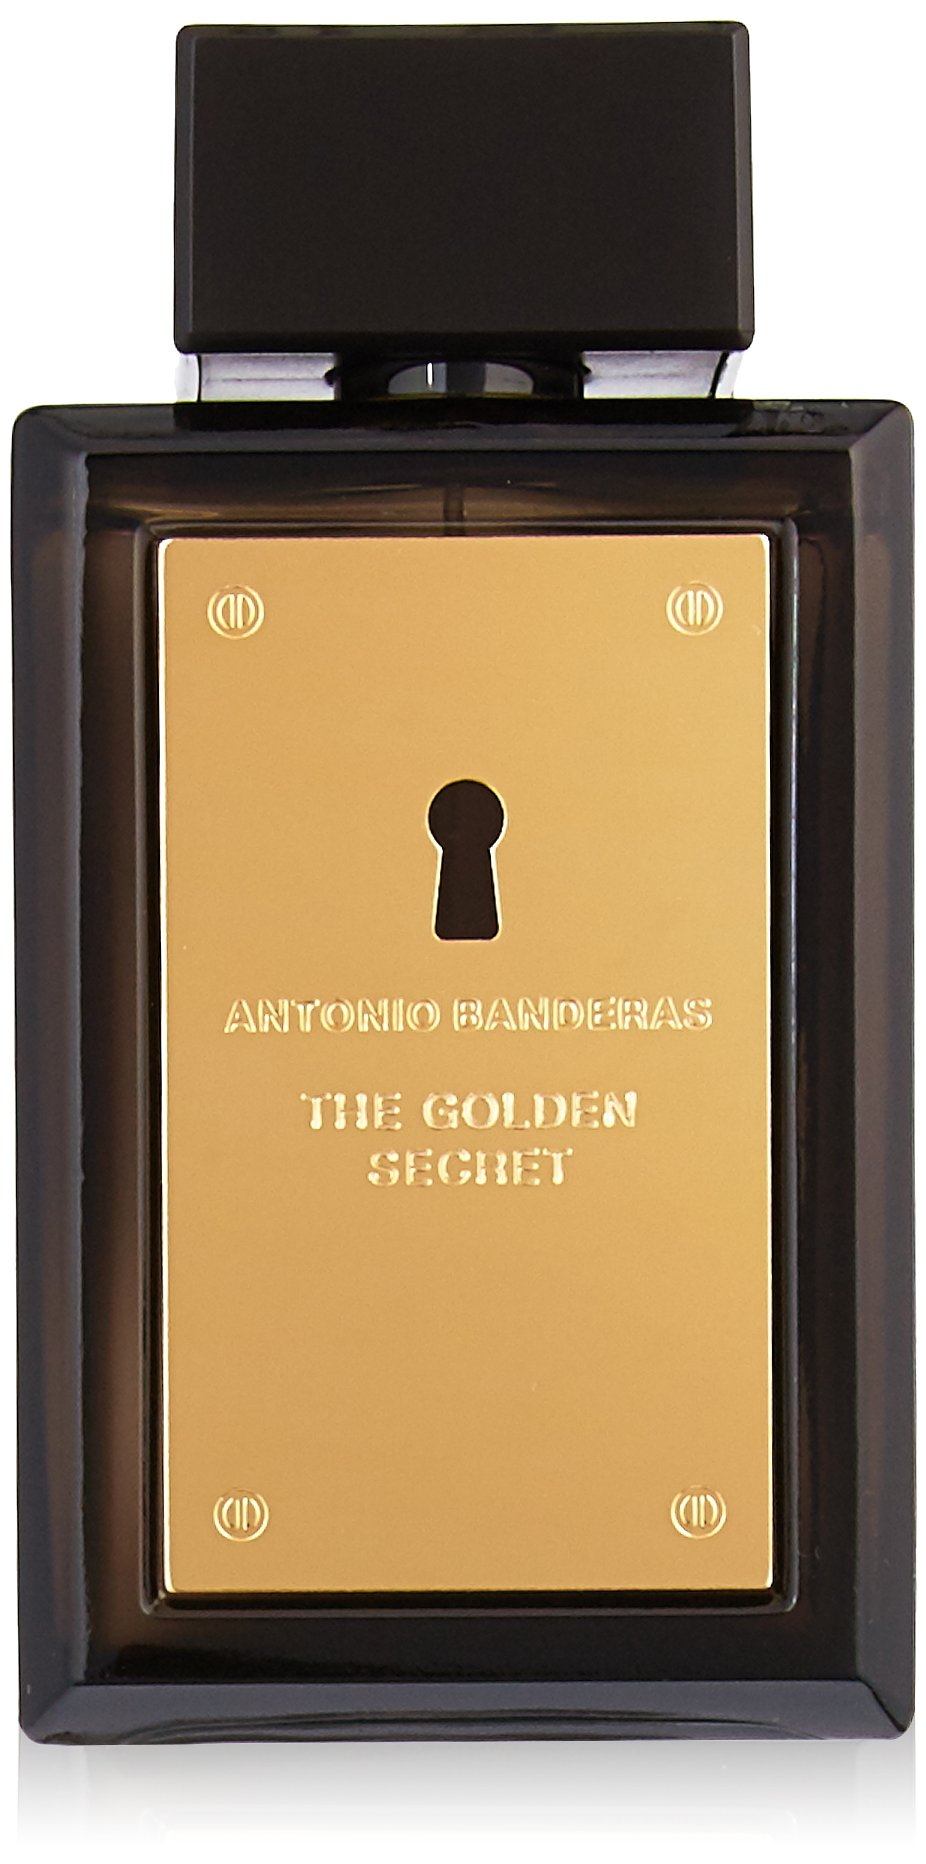 Perfume The Golden Secret Masculino Antonio Banderas Edt 100ml - Incolor - Único